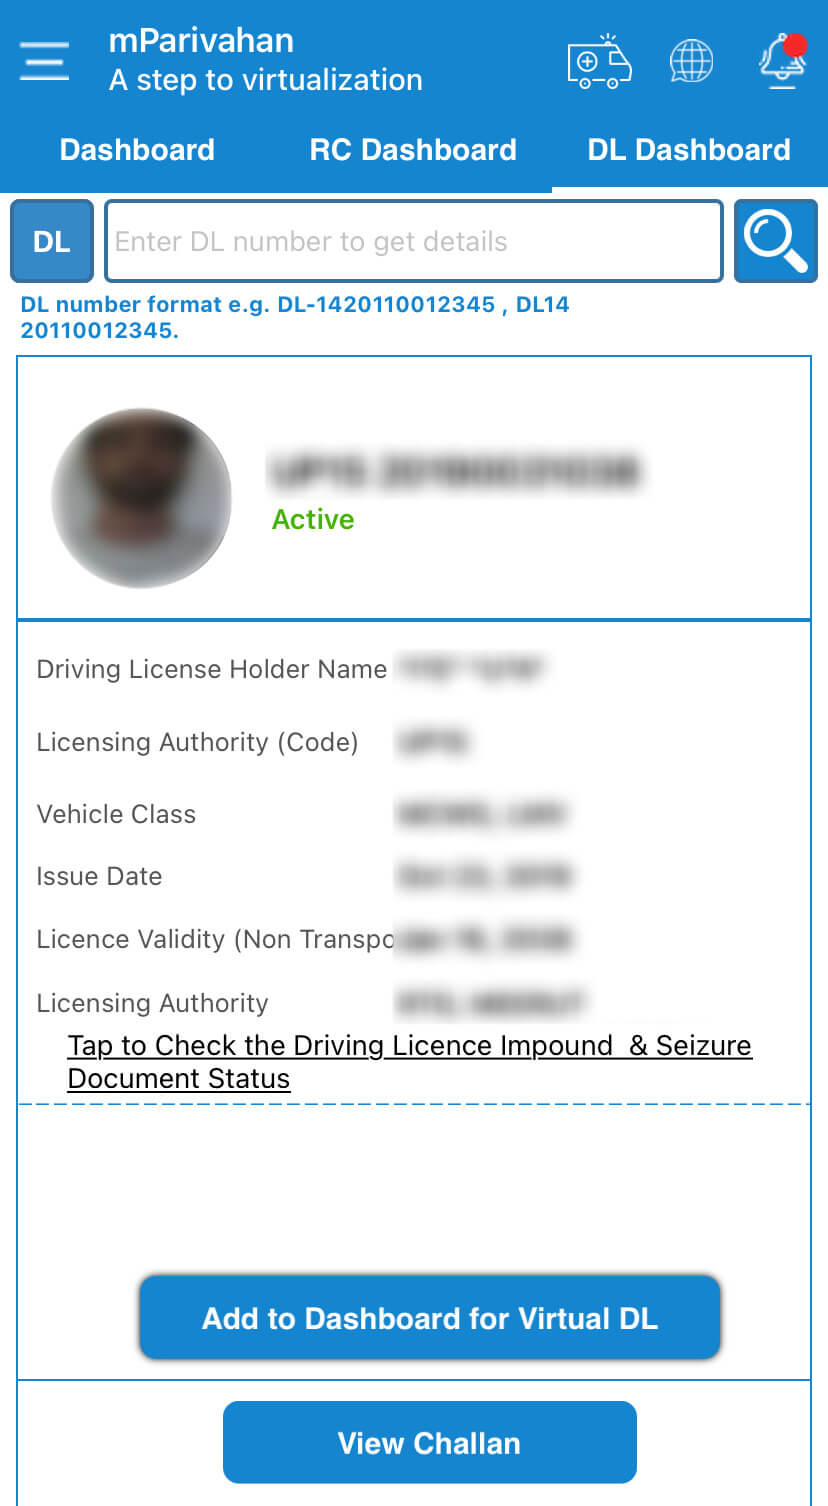 Add virtual driving license to dashboard in mParivahan